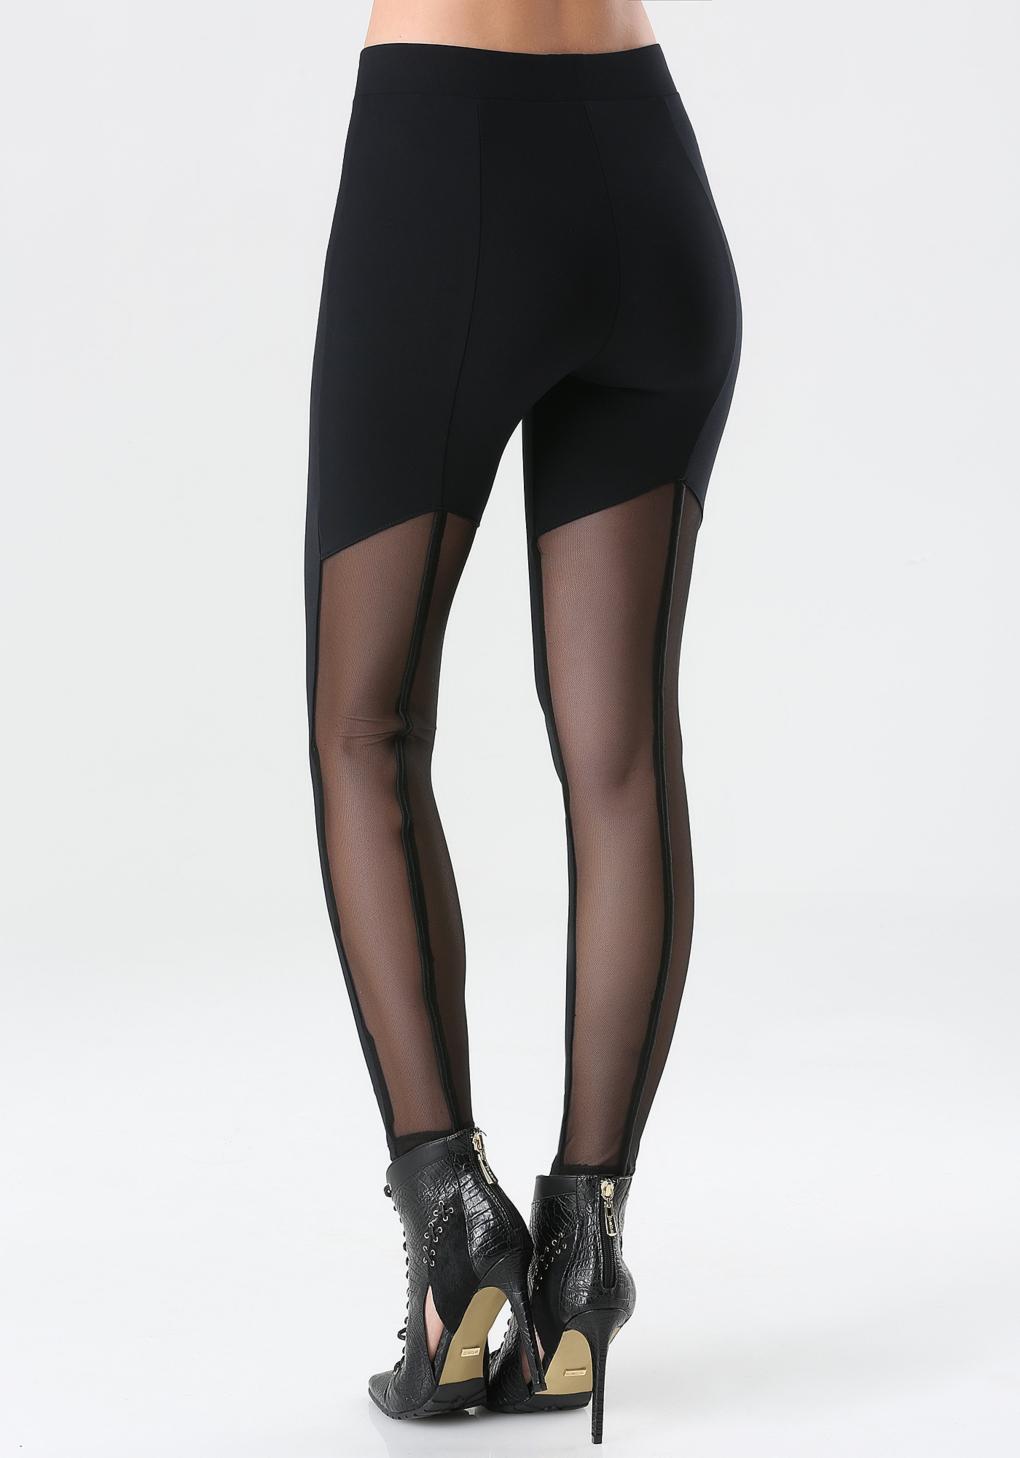 Bebe Back Mesh Leggings in Black | Lyst